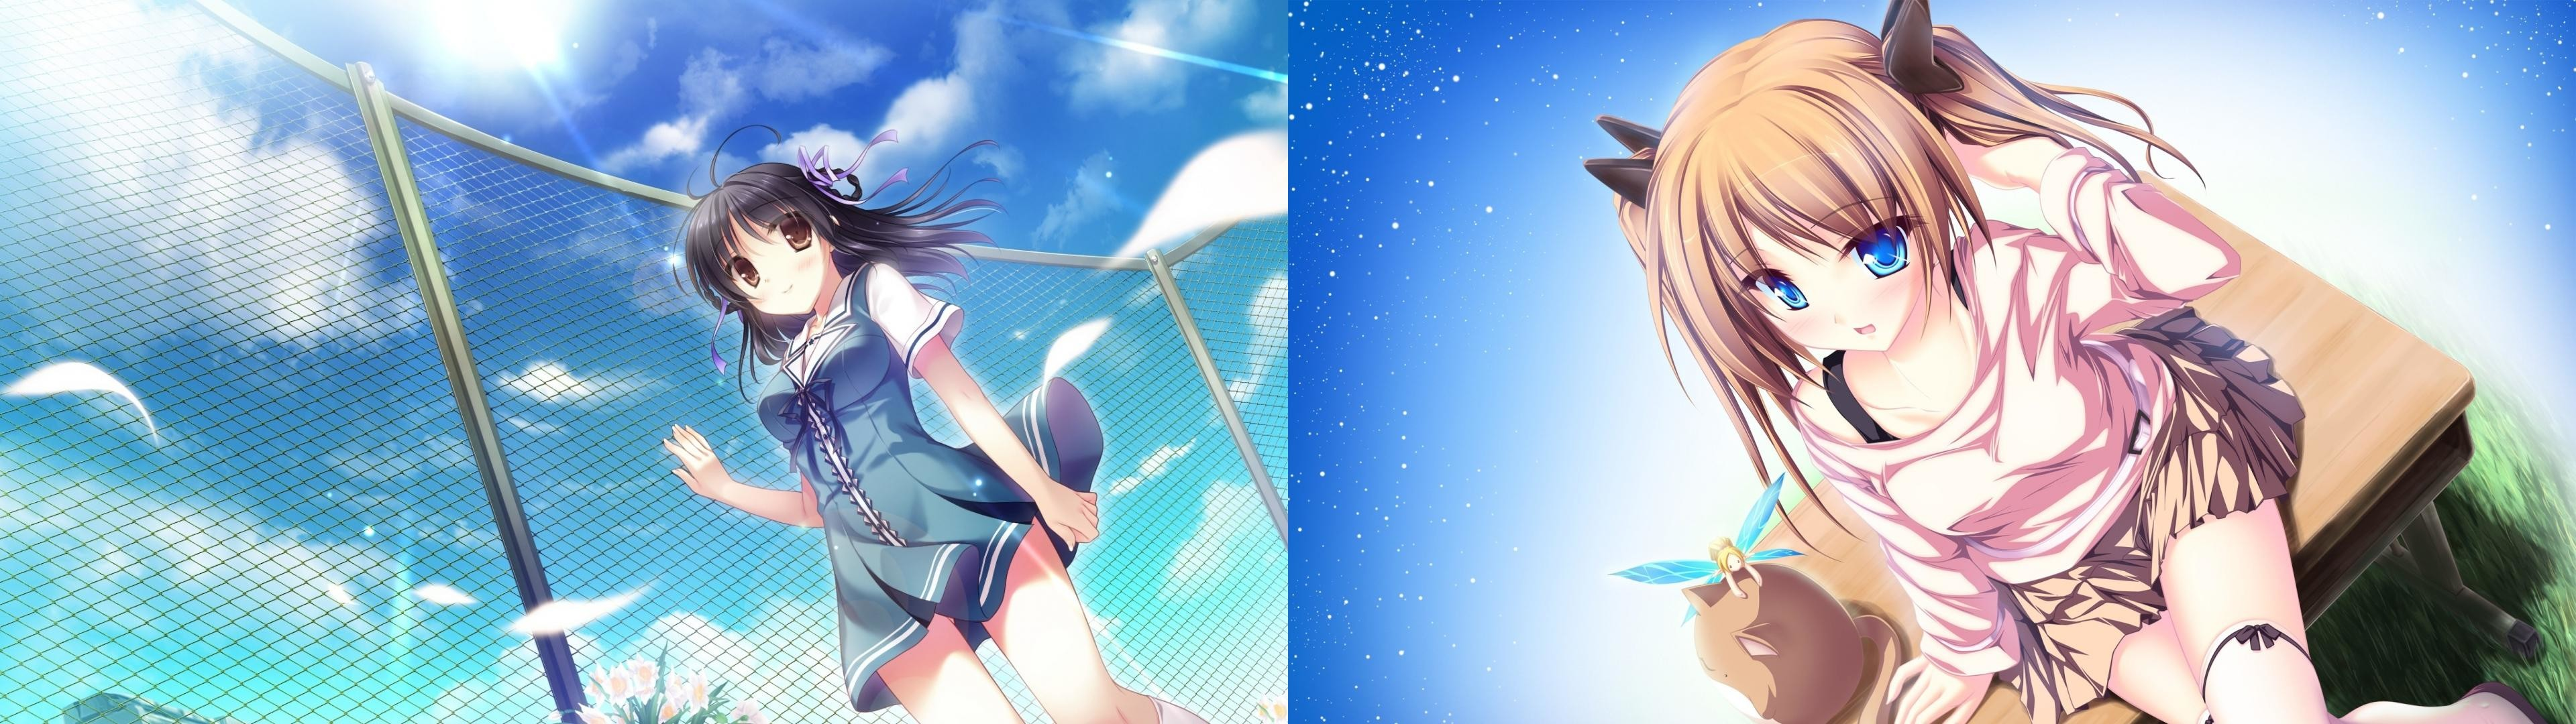 Dual Screen Anime Wallpapers 3840×1080